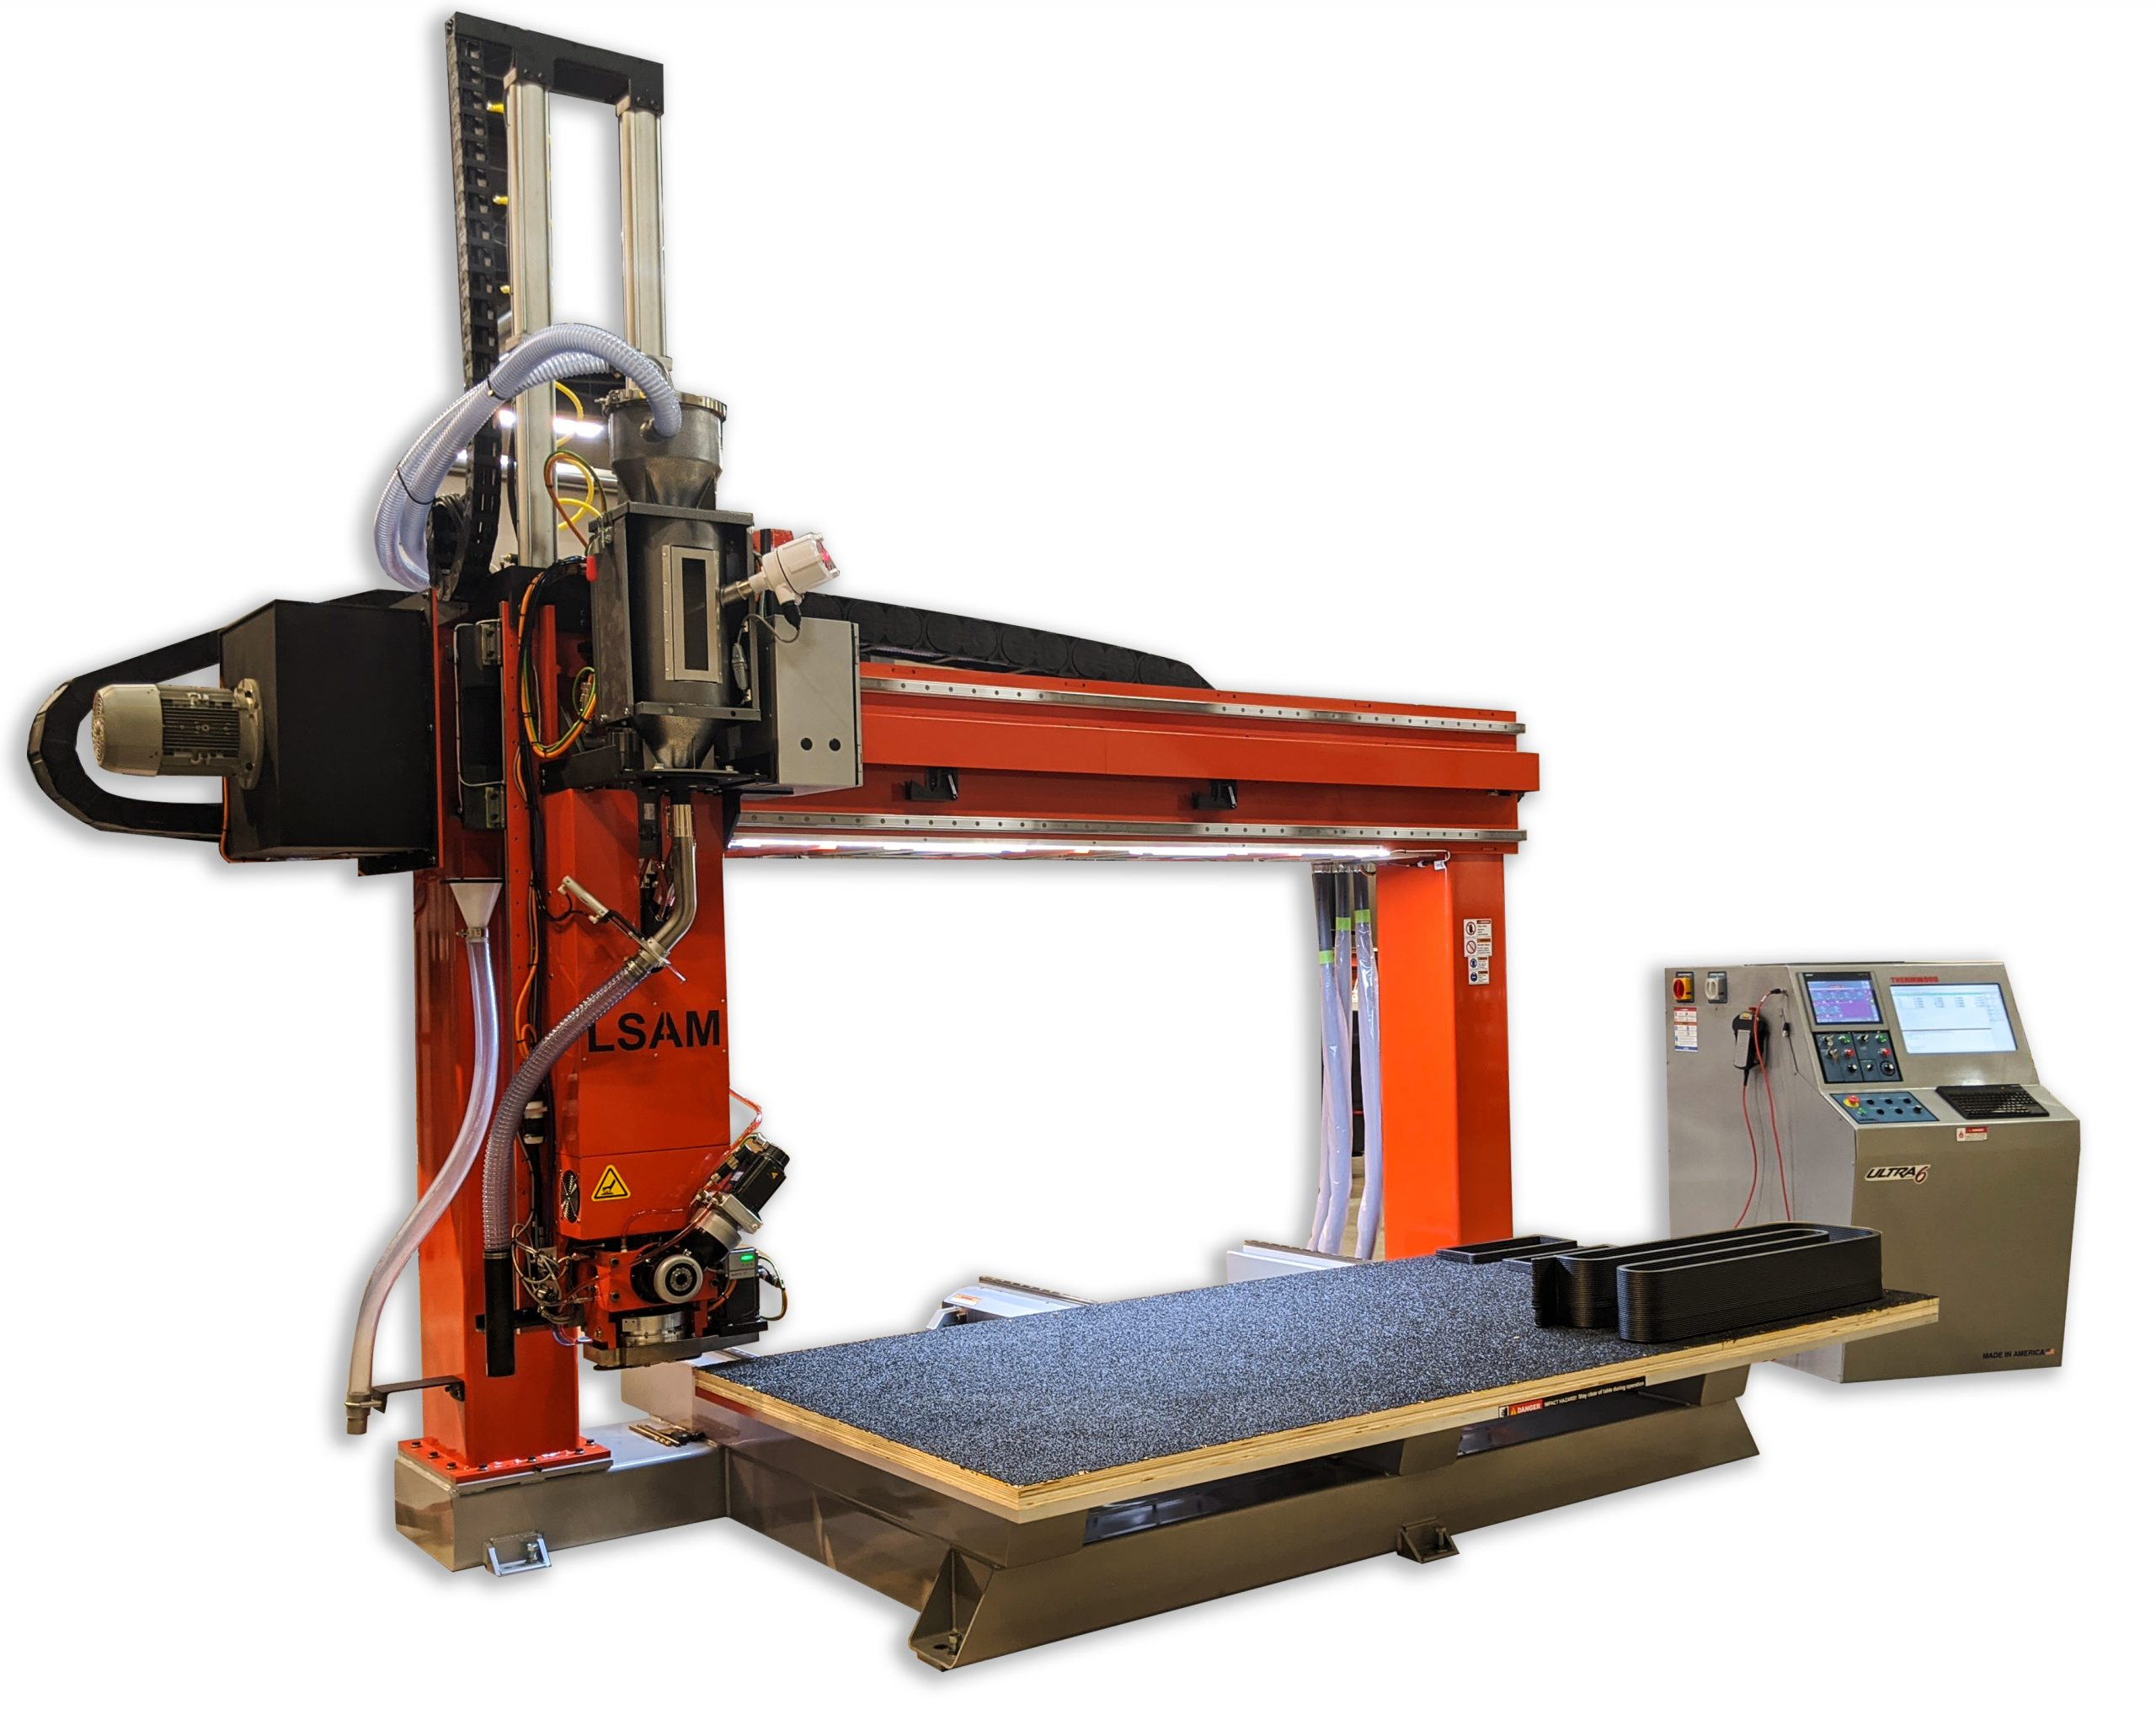 The LSAM additive printer. Image via Purdue Univeristy.